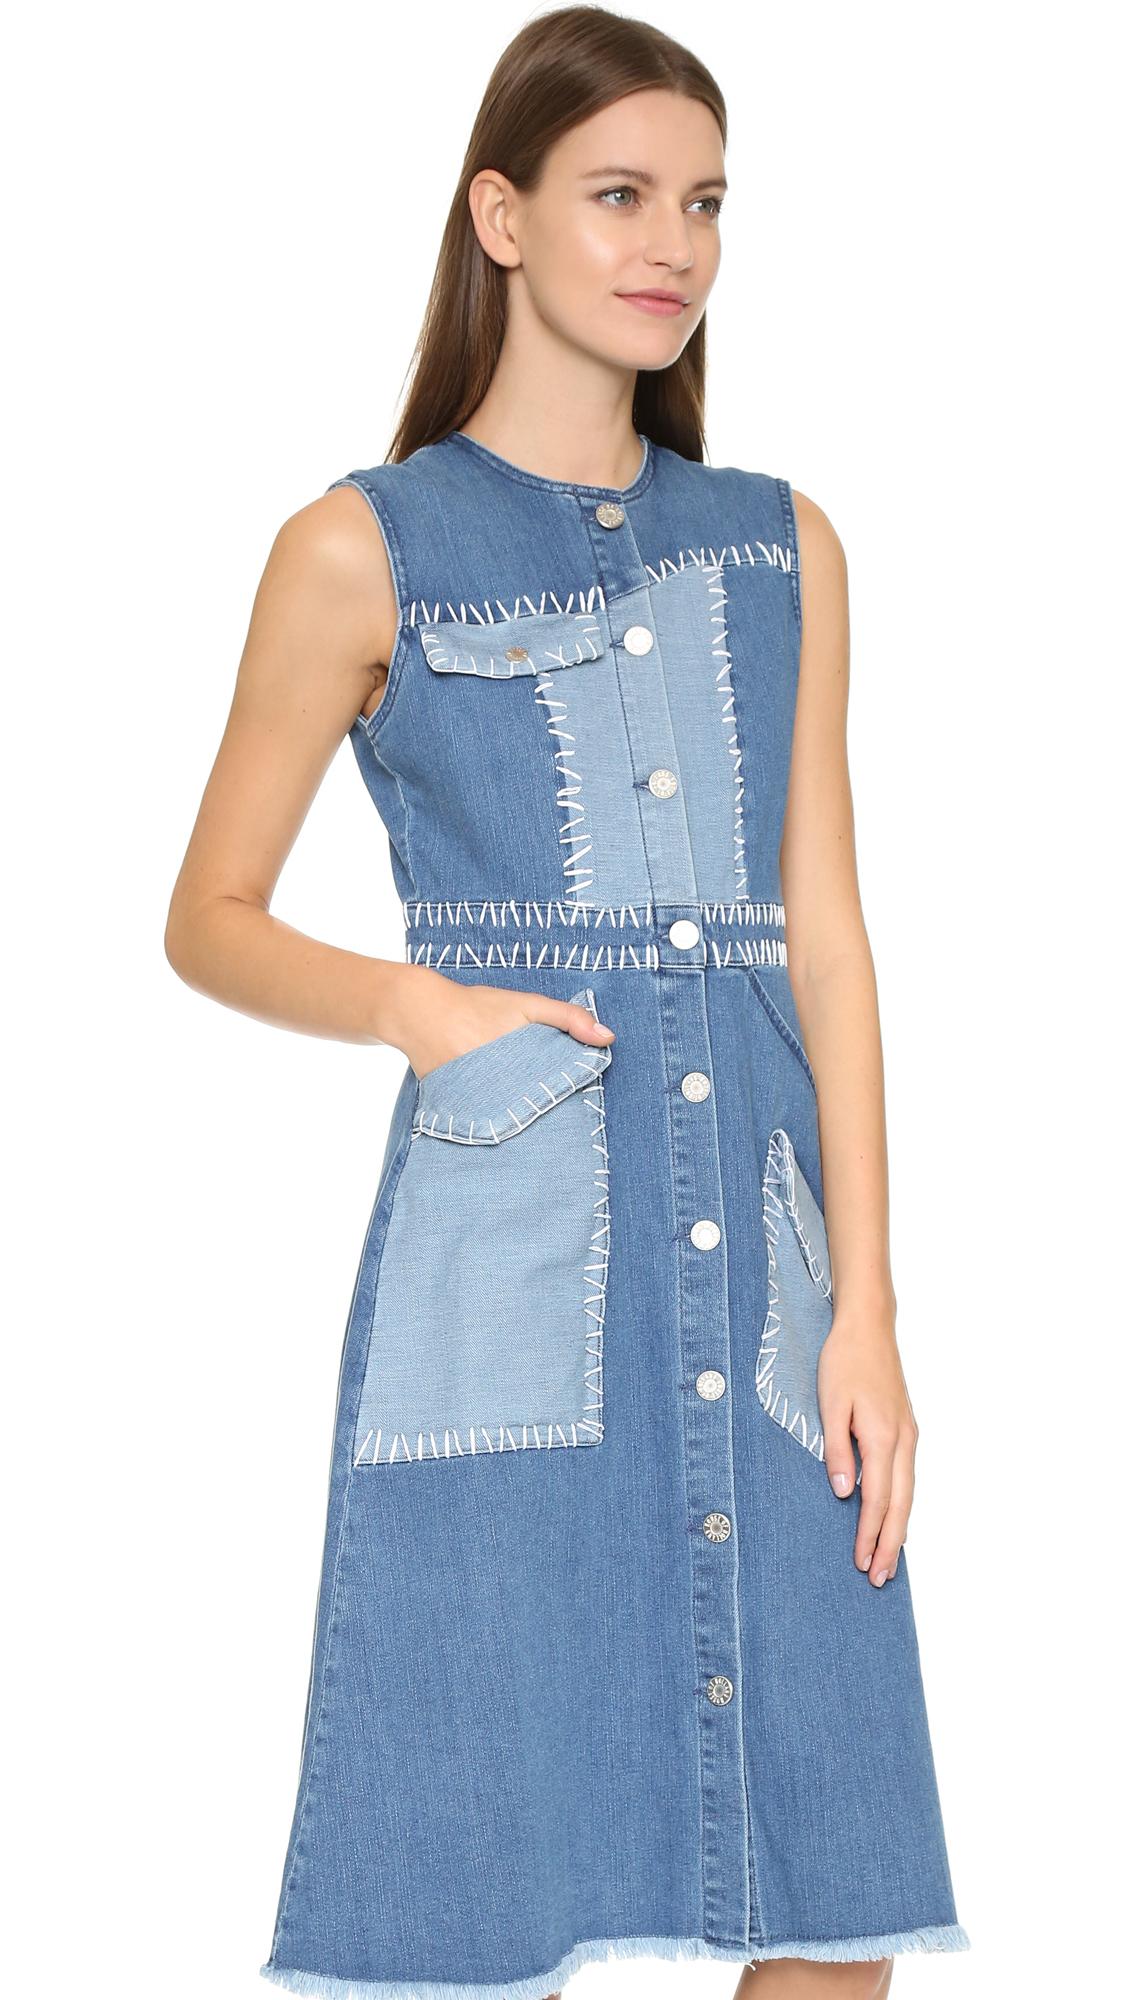 65e4fa9eb4cb1 Turmec » sleeveless house dresses for women